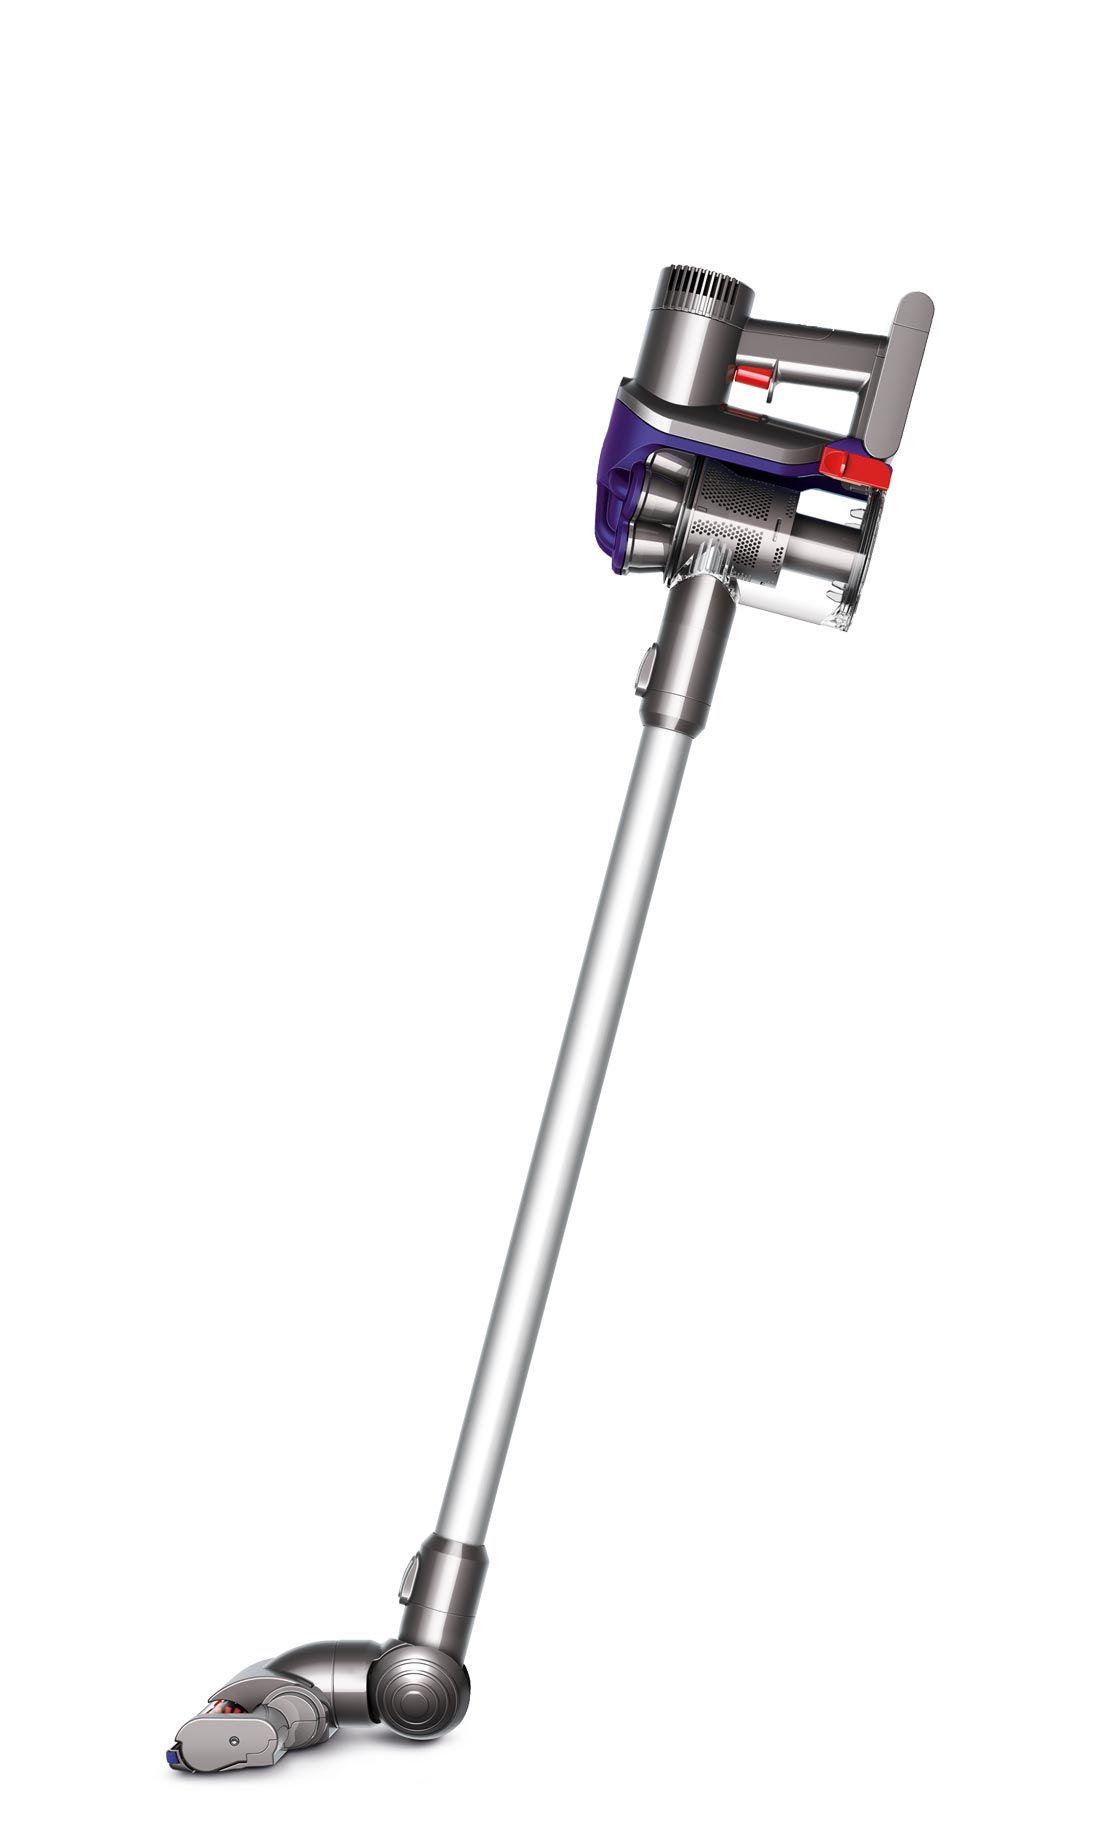 Dyson DC35 Digital Slim Multi Floor Cordless Vacuum Cleaner Http://www.dyson